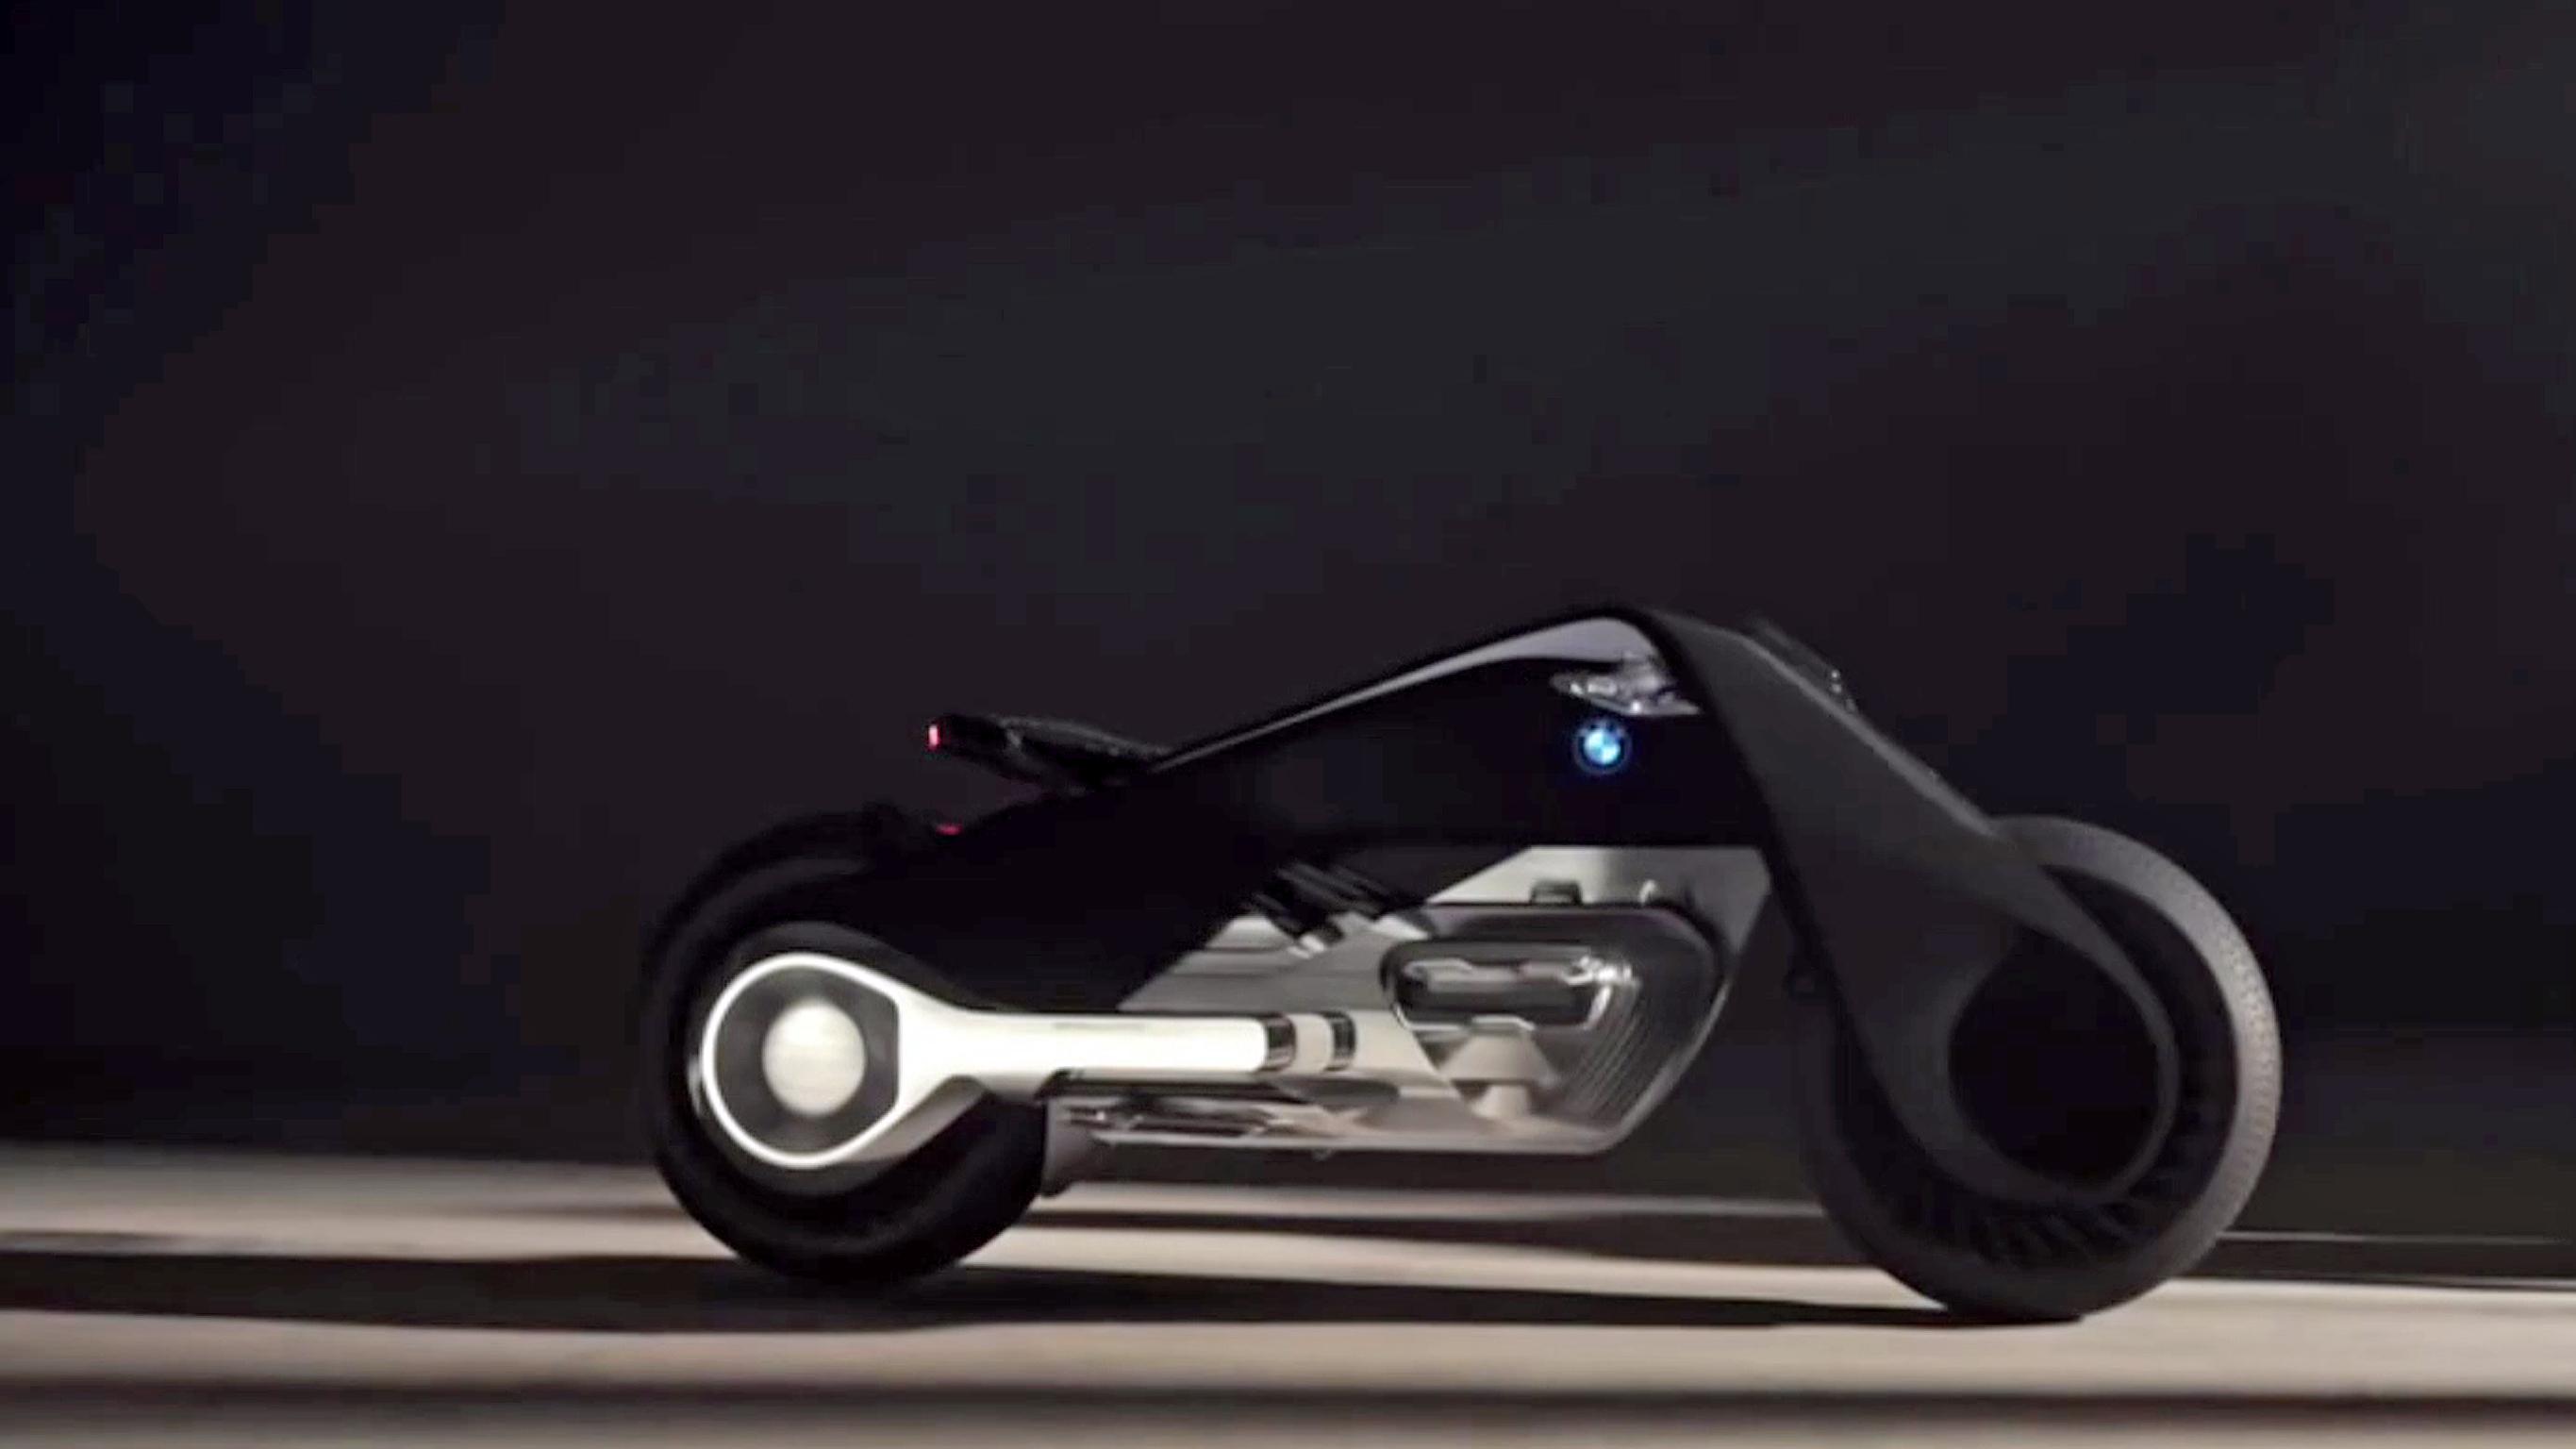 2016 Programa 189 - BMW mira al futuro